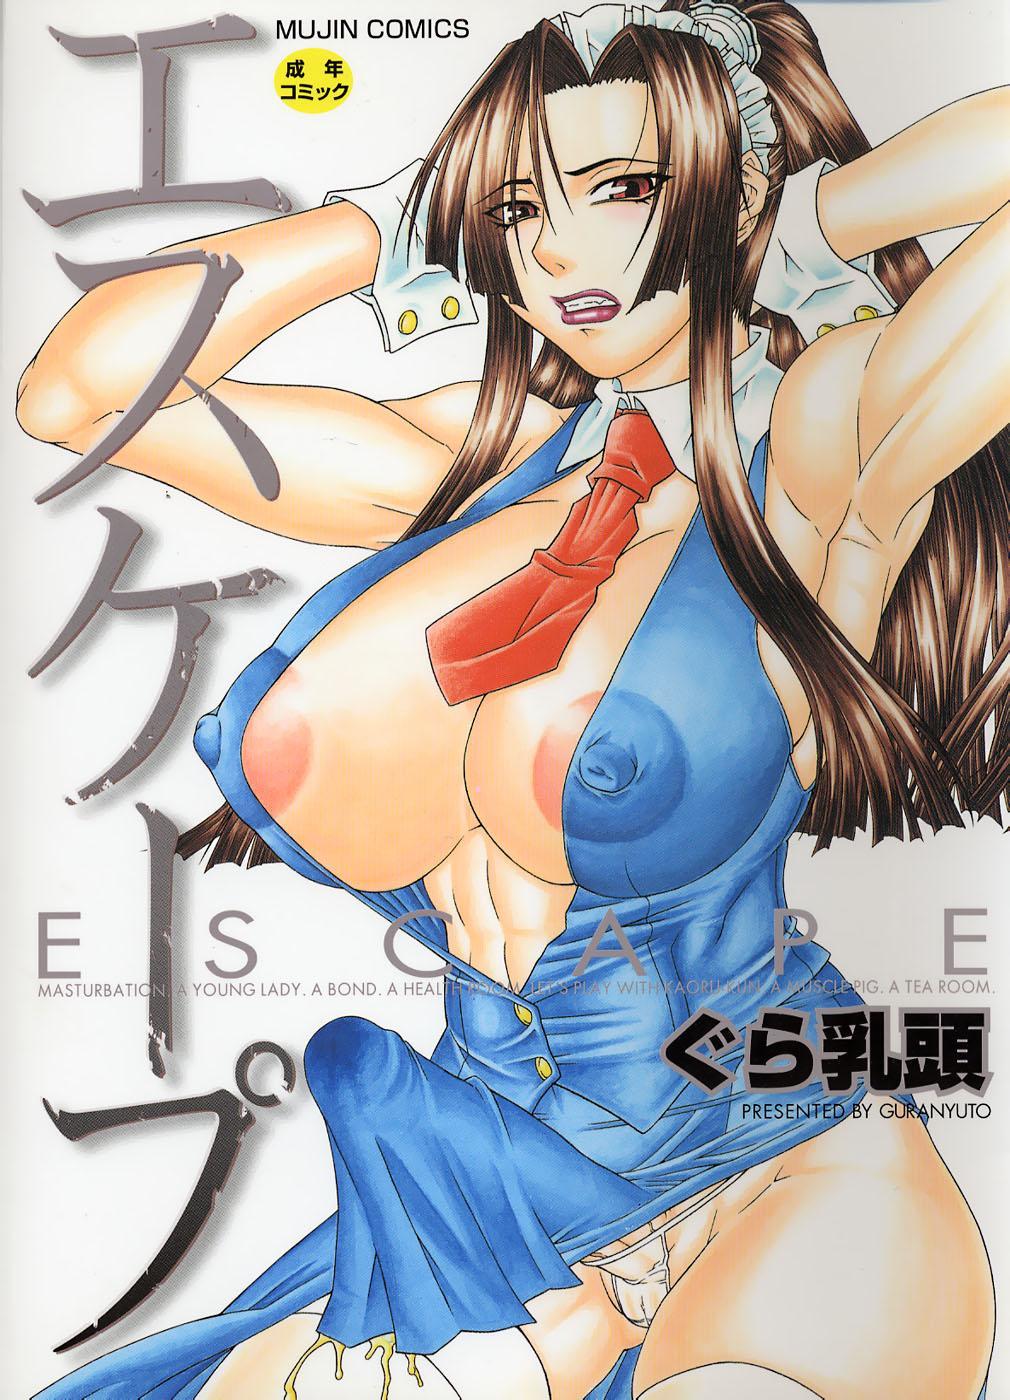 Gura Nyuutou - Escape chapter 7 0